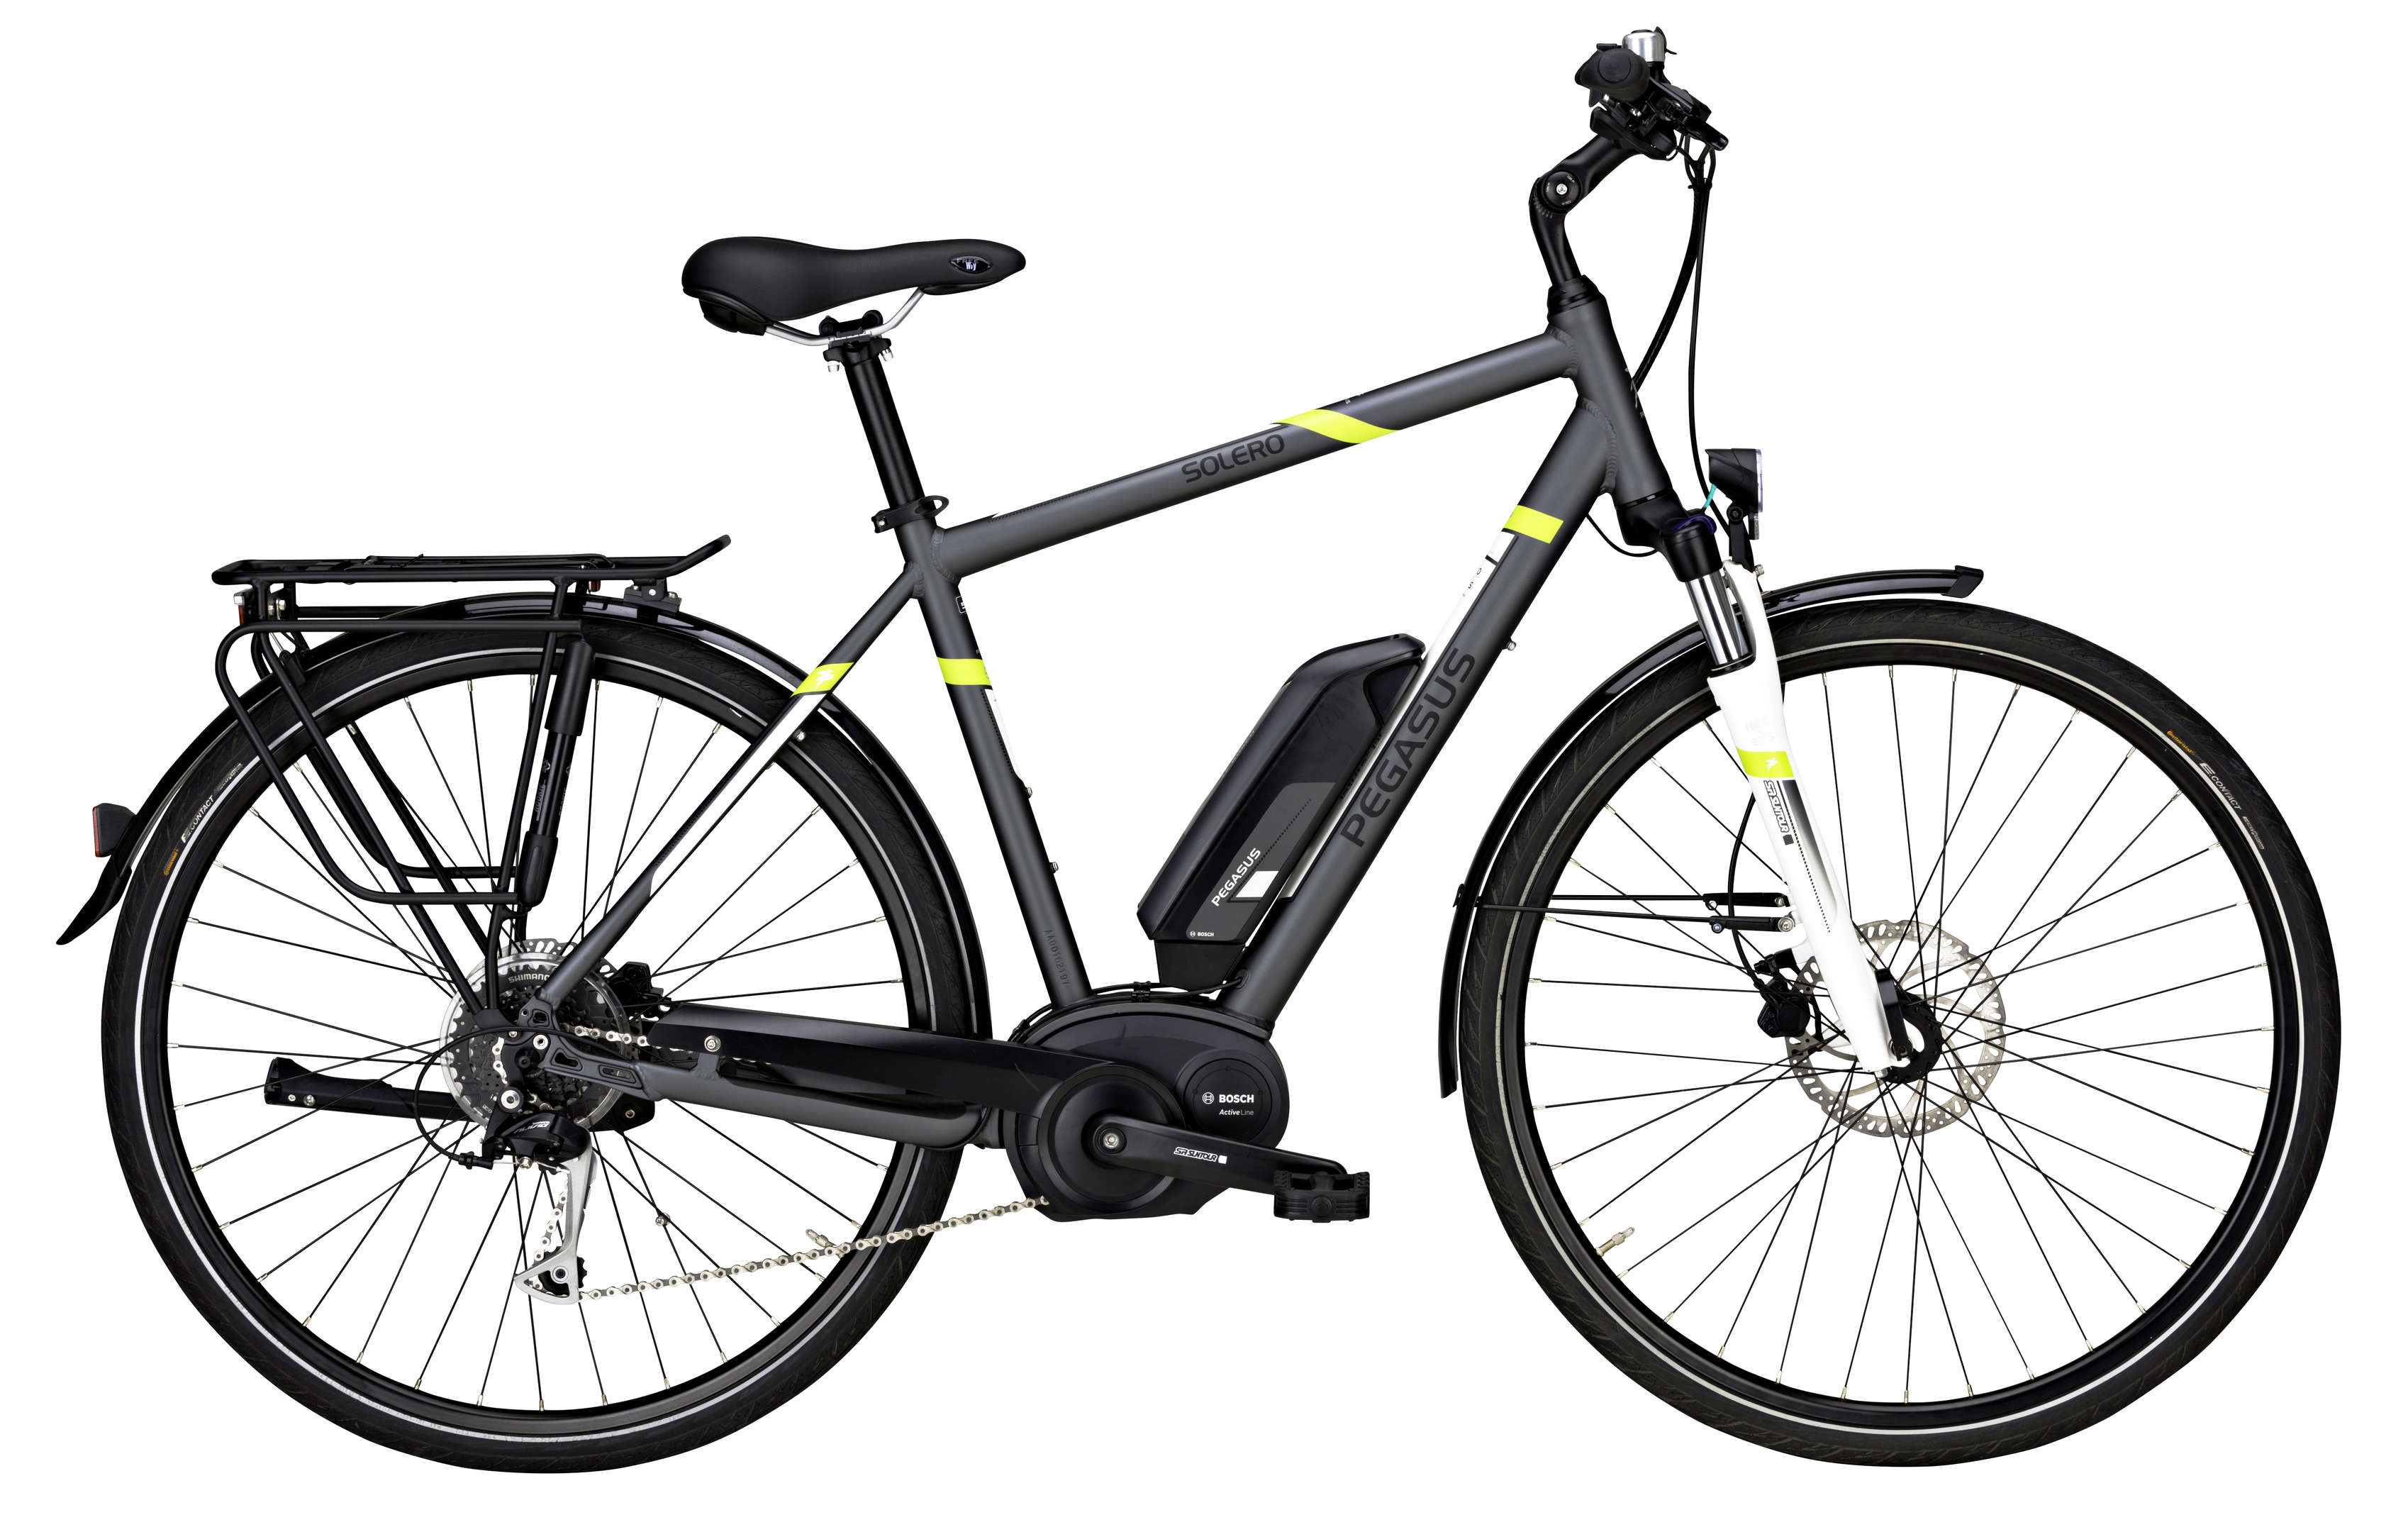 pegasus e bike solero e8 eurorad bikeleasingeurorad. Black Bedroom Furniture Sets. Home Design Ideas